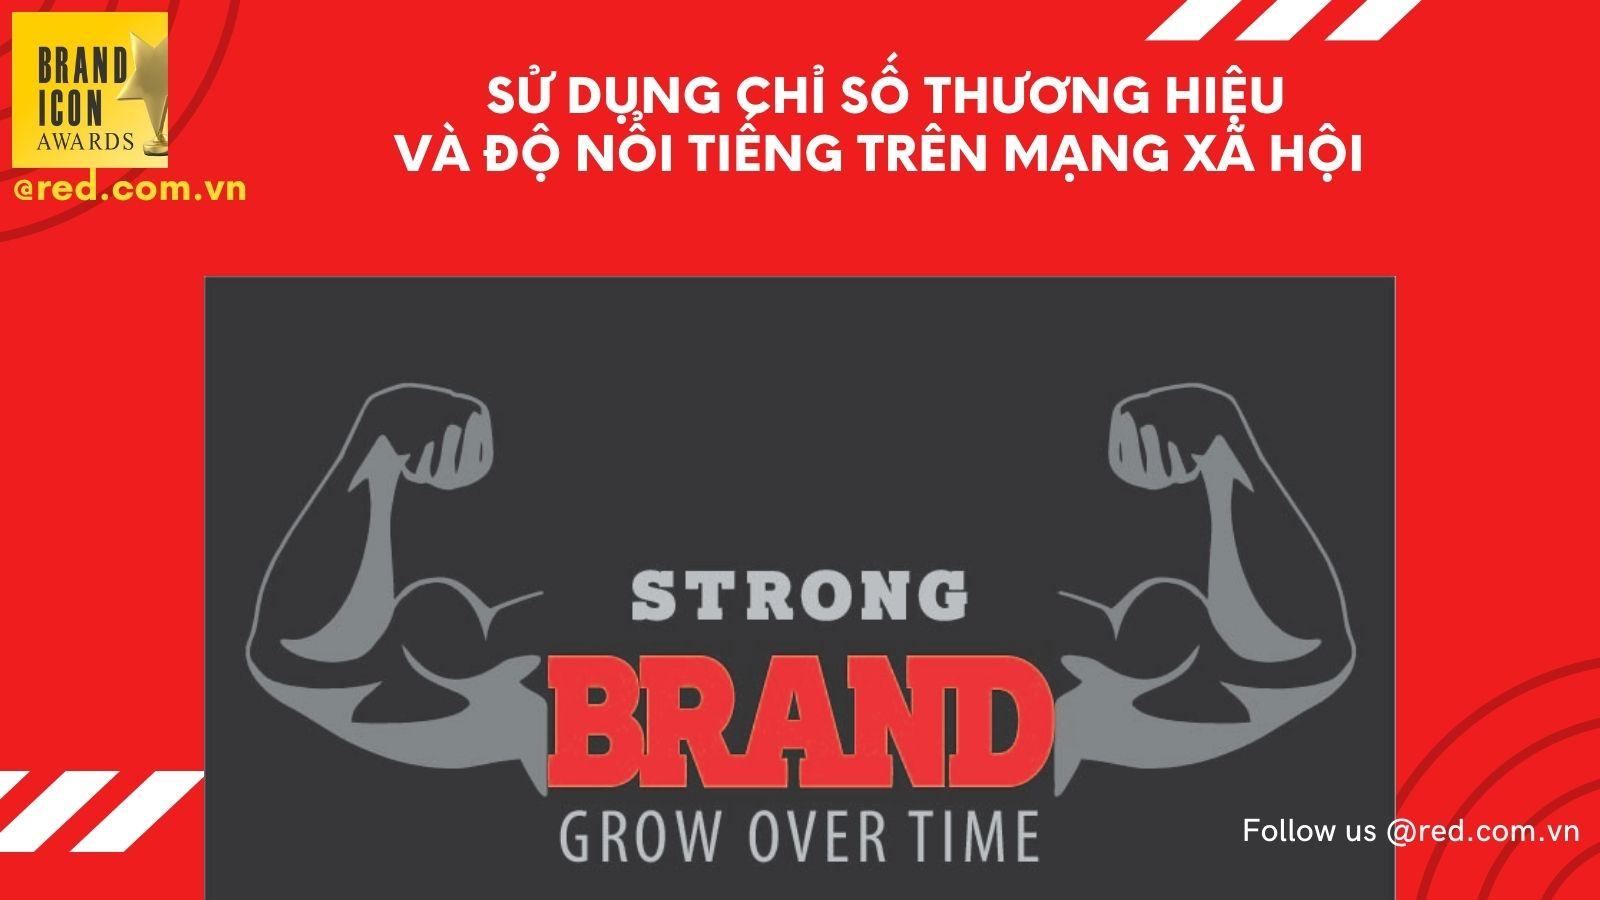 SUC KHOE THUONG HIEU REDCOMVN 1